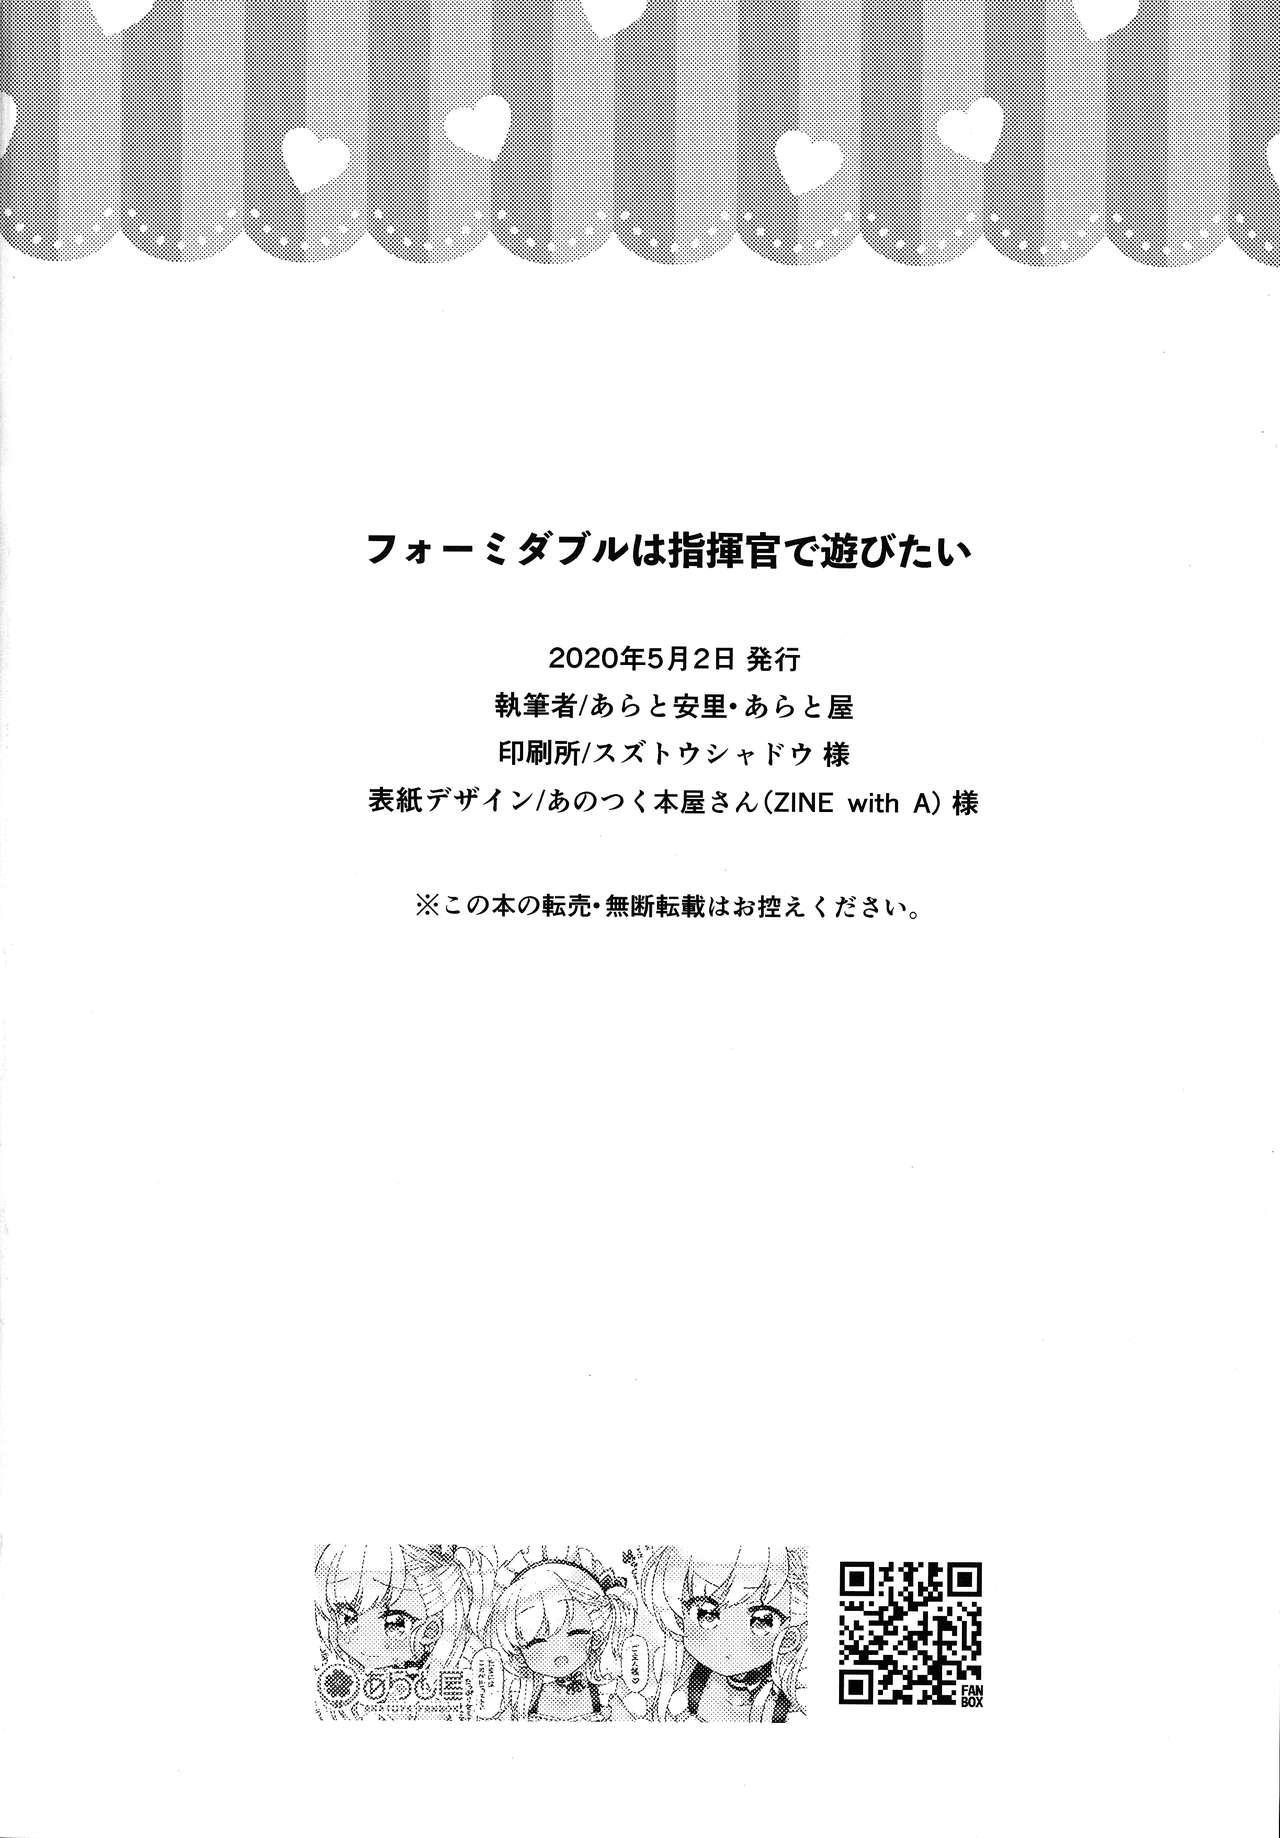 Formidable wa Shikikan de Asobitai - Formidable wants to play a commander 20